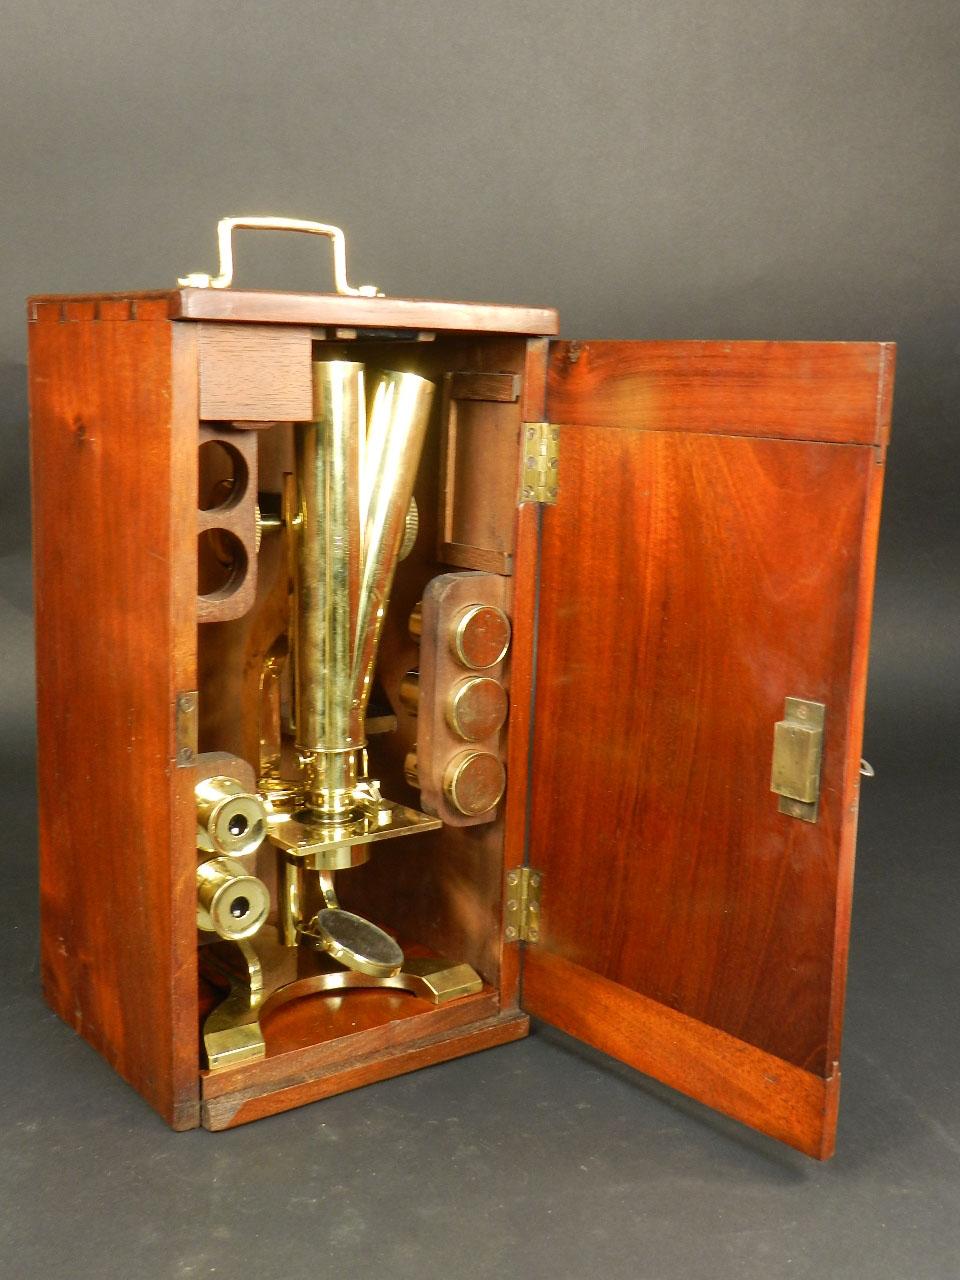 Imagen MICROSCOPIO BINOCULAR H.W. CROUCH AÑO 1862 24891